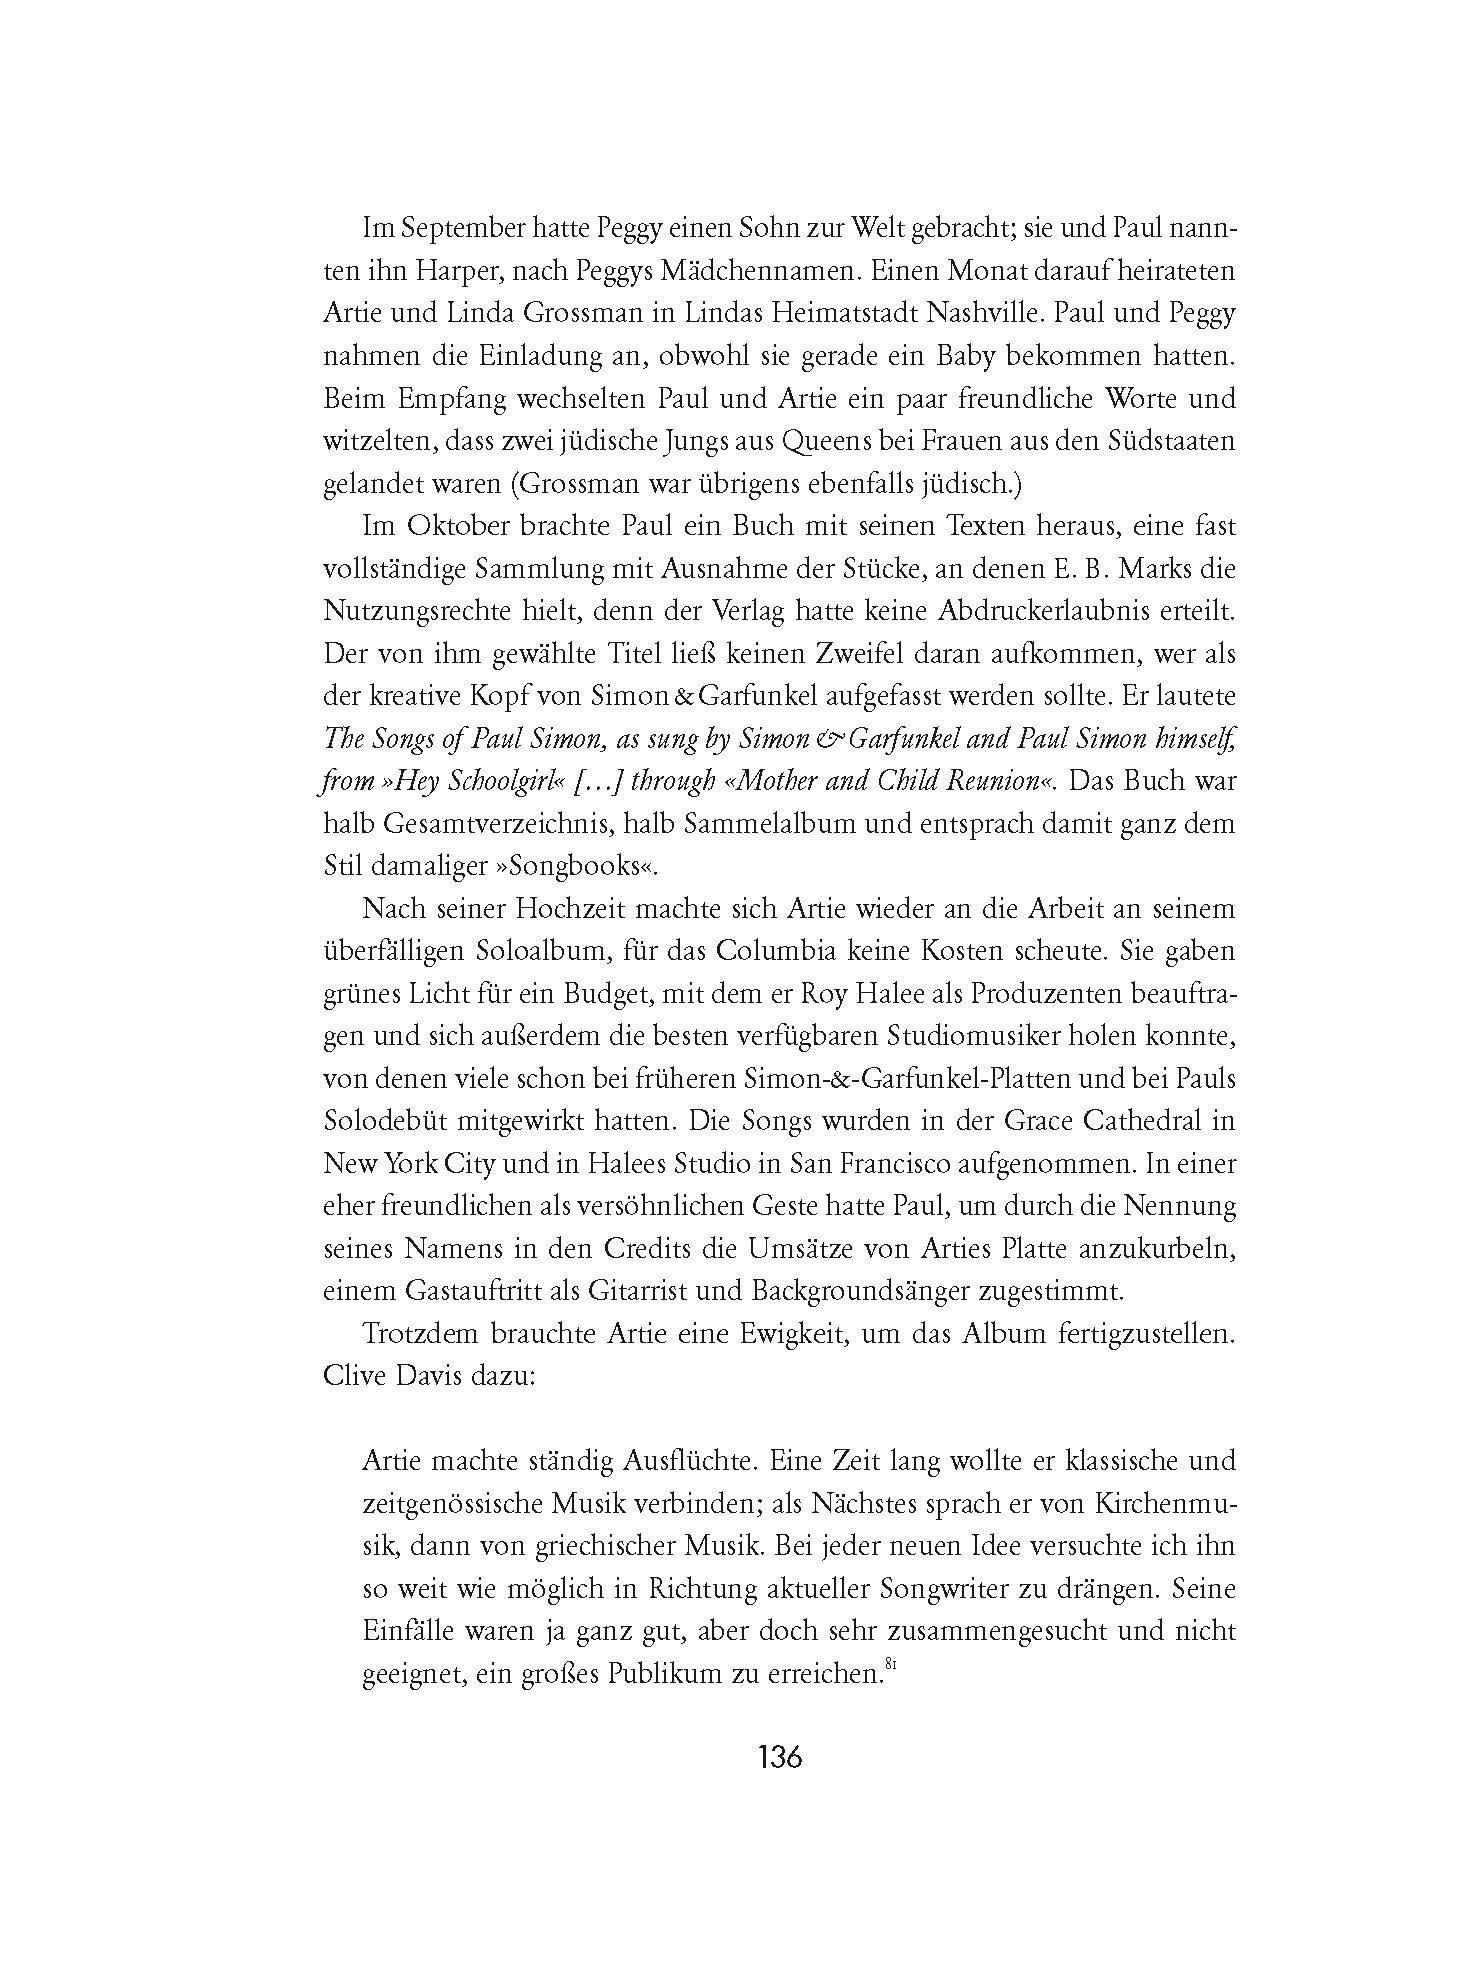 Paul Simon Marc Eliot Books Amazon